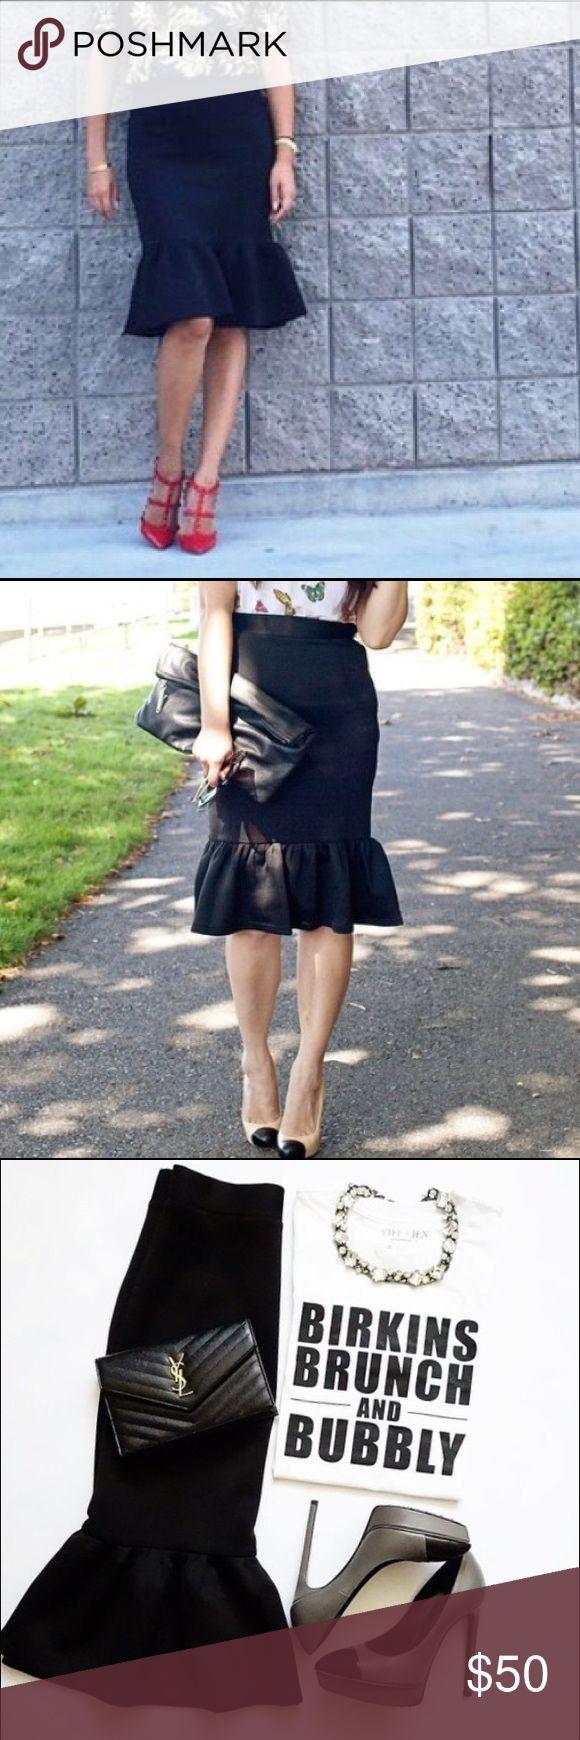 Adorable Black Peplum Skirt Size Small Size small, new without tags, black peplum skirt! Super classy and oh so stylish! Skirts Midi